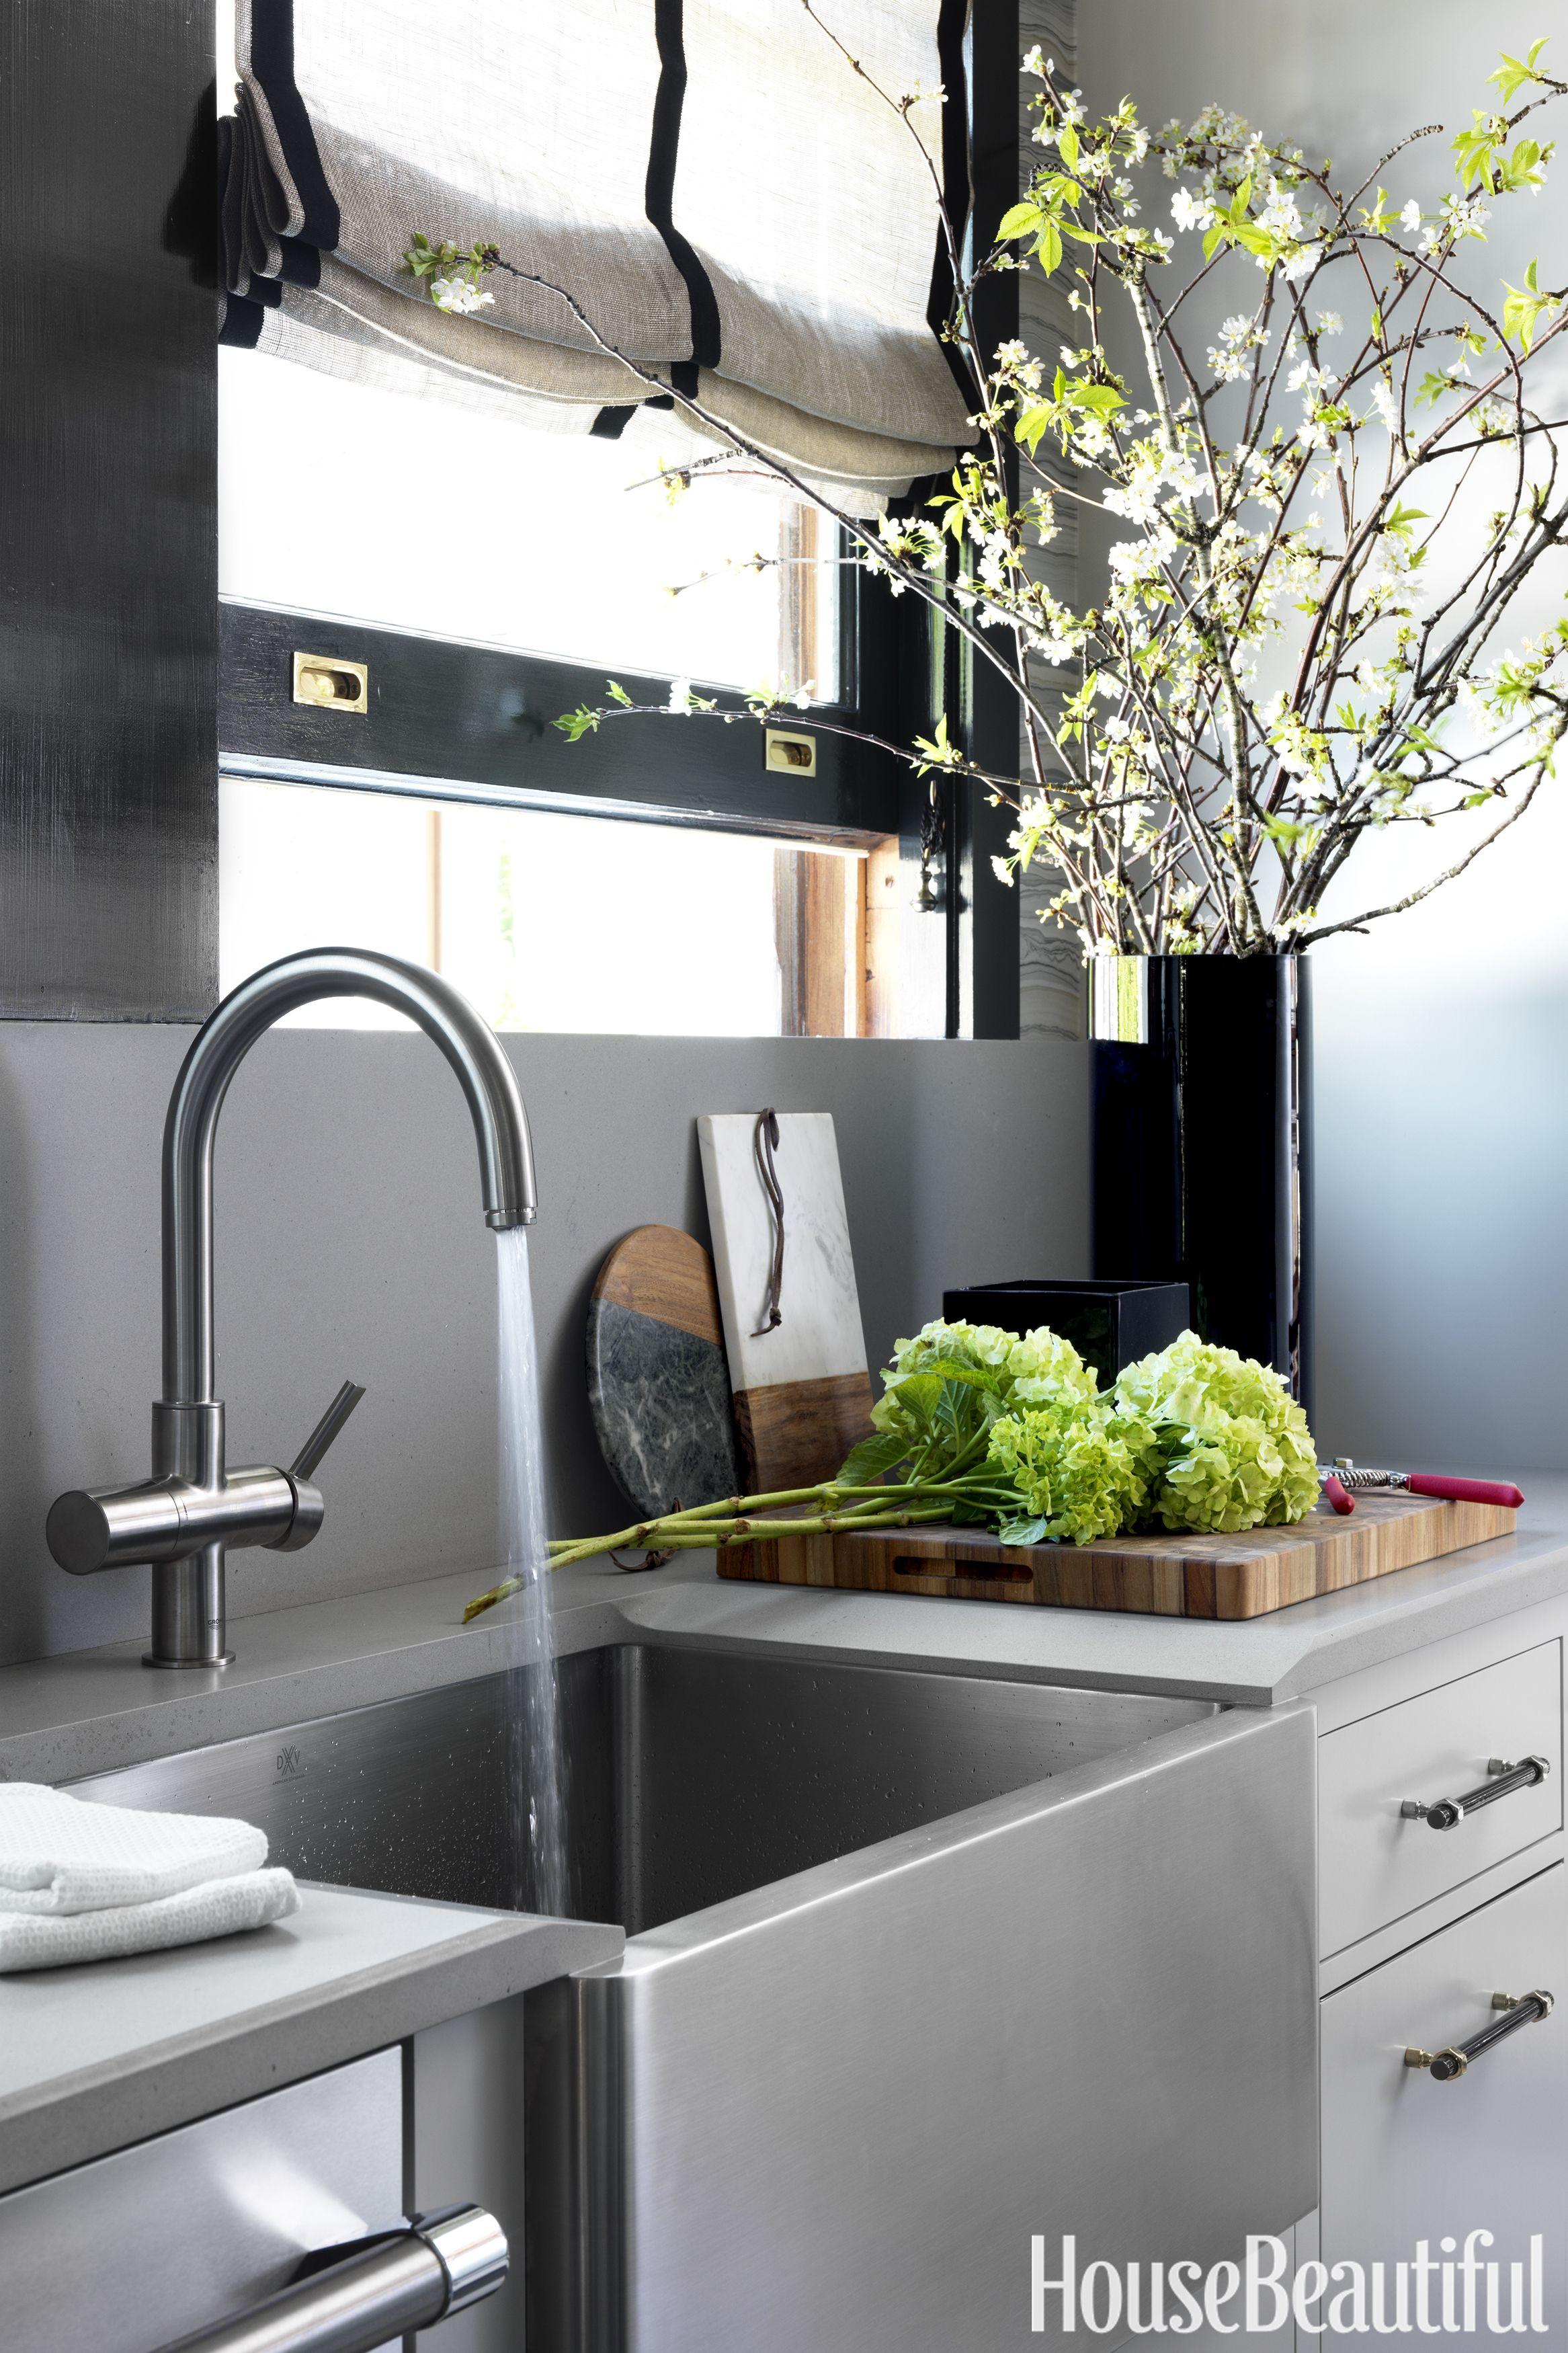 20+ Best Kitchen Countertops Design Ideas - Types of ... on Kitchen Countertop Decor  id=72845